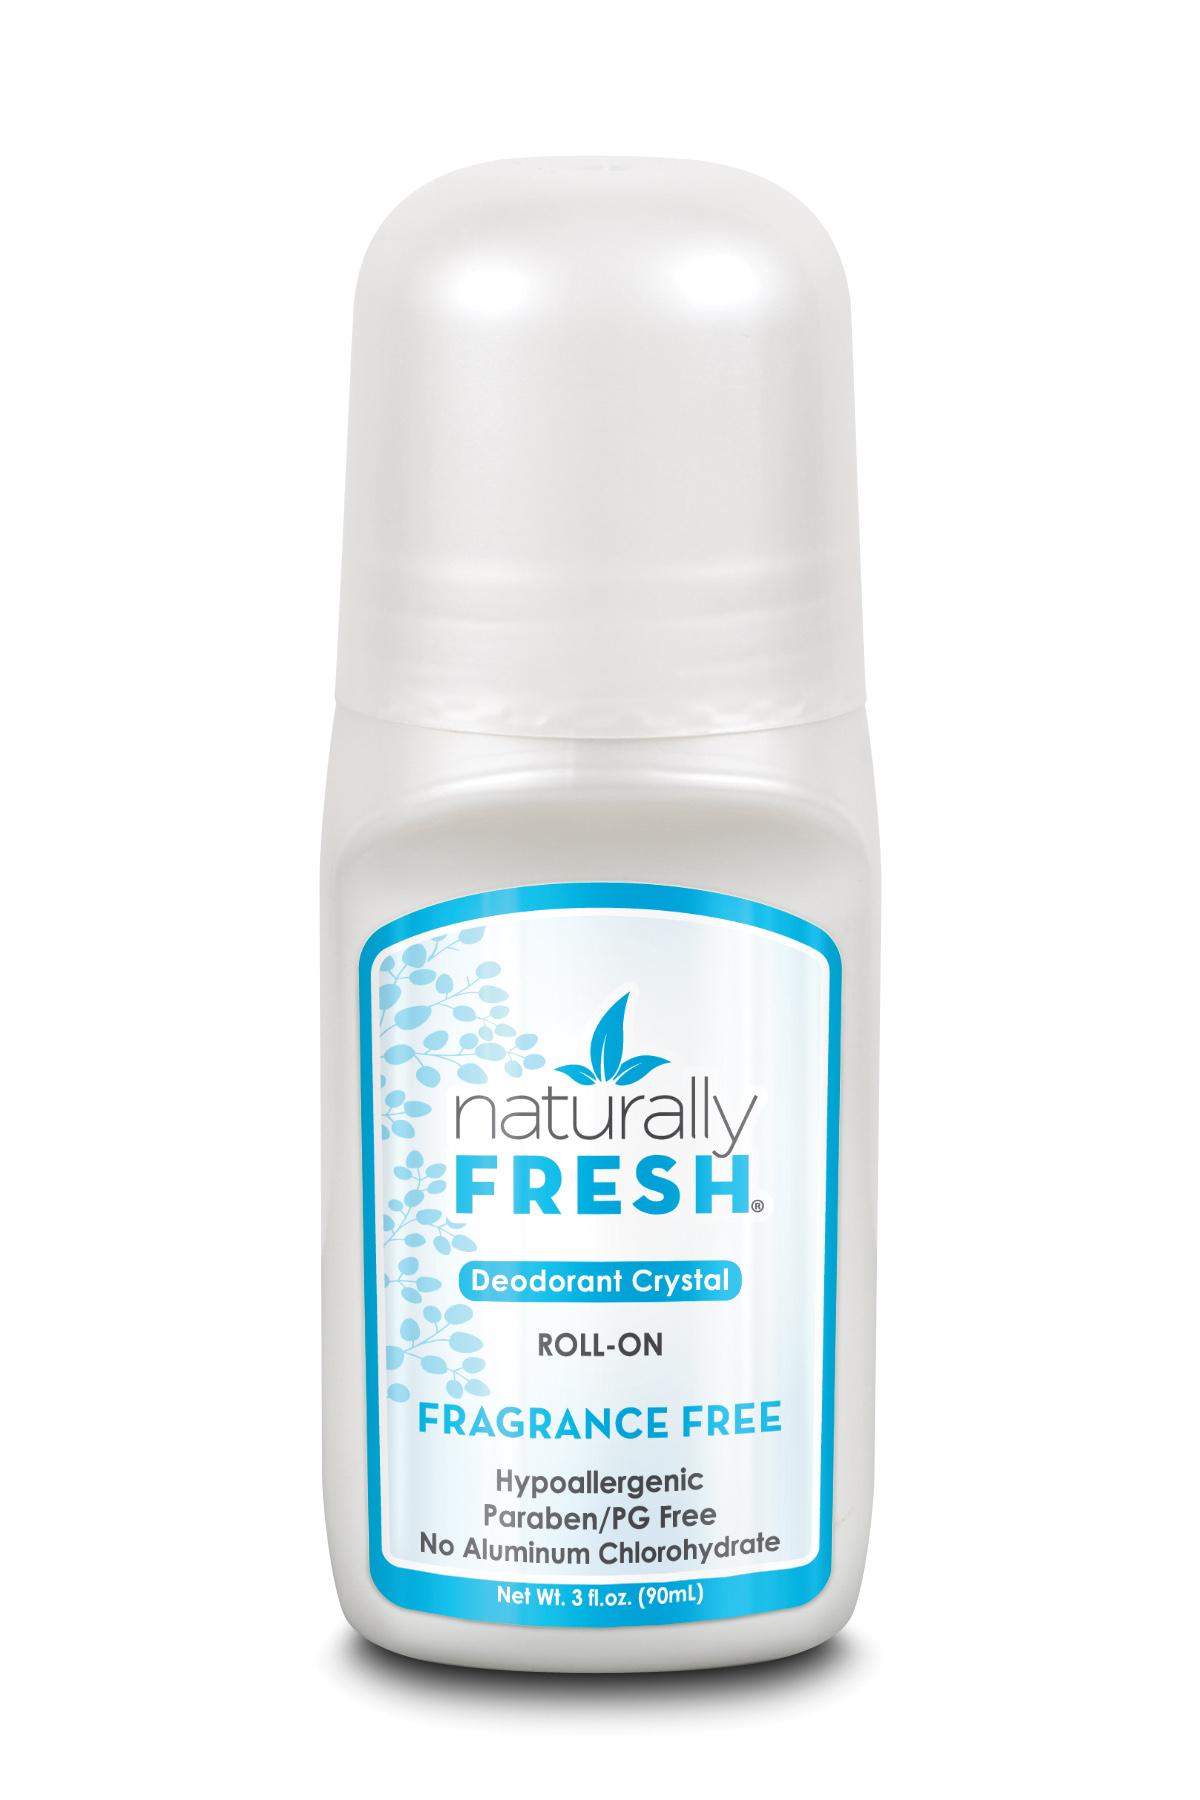 Deodorant Crystal Roll-On Fragrance Free 90ml (White)